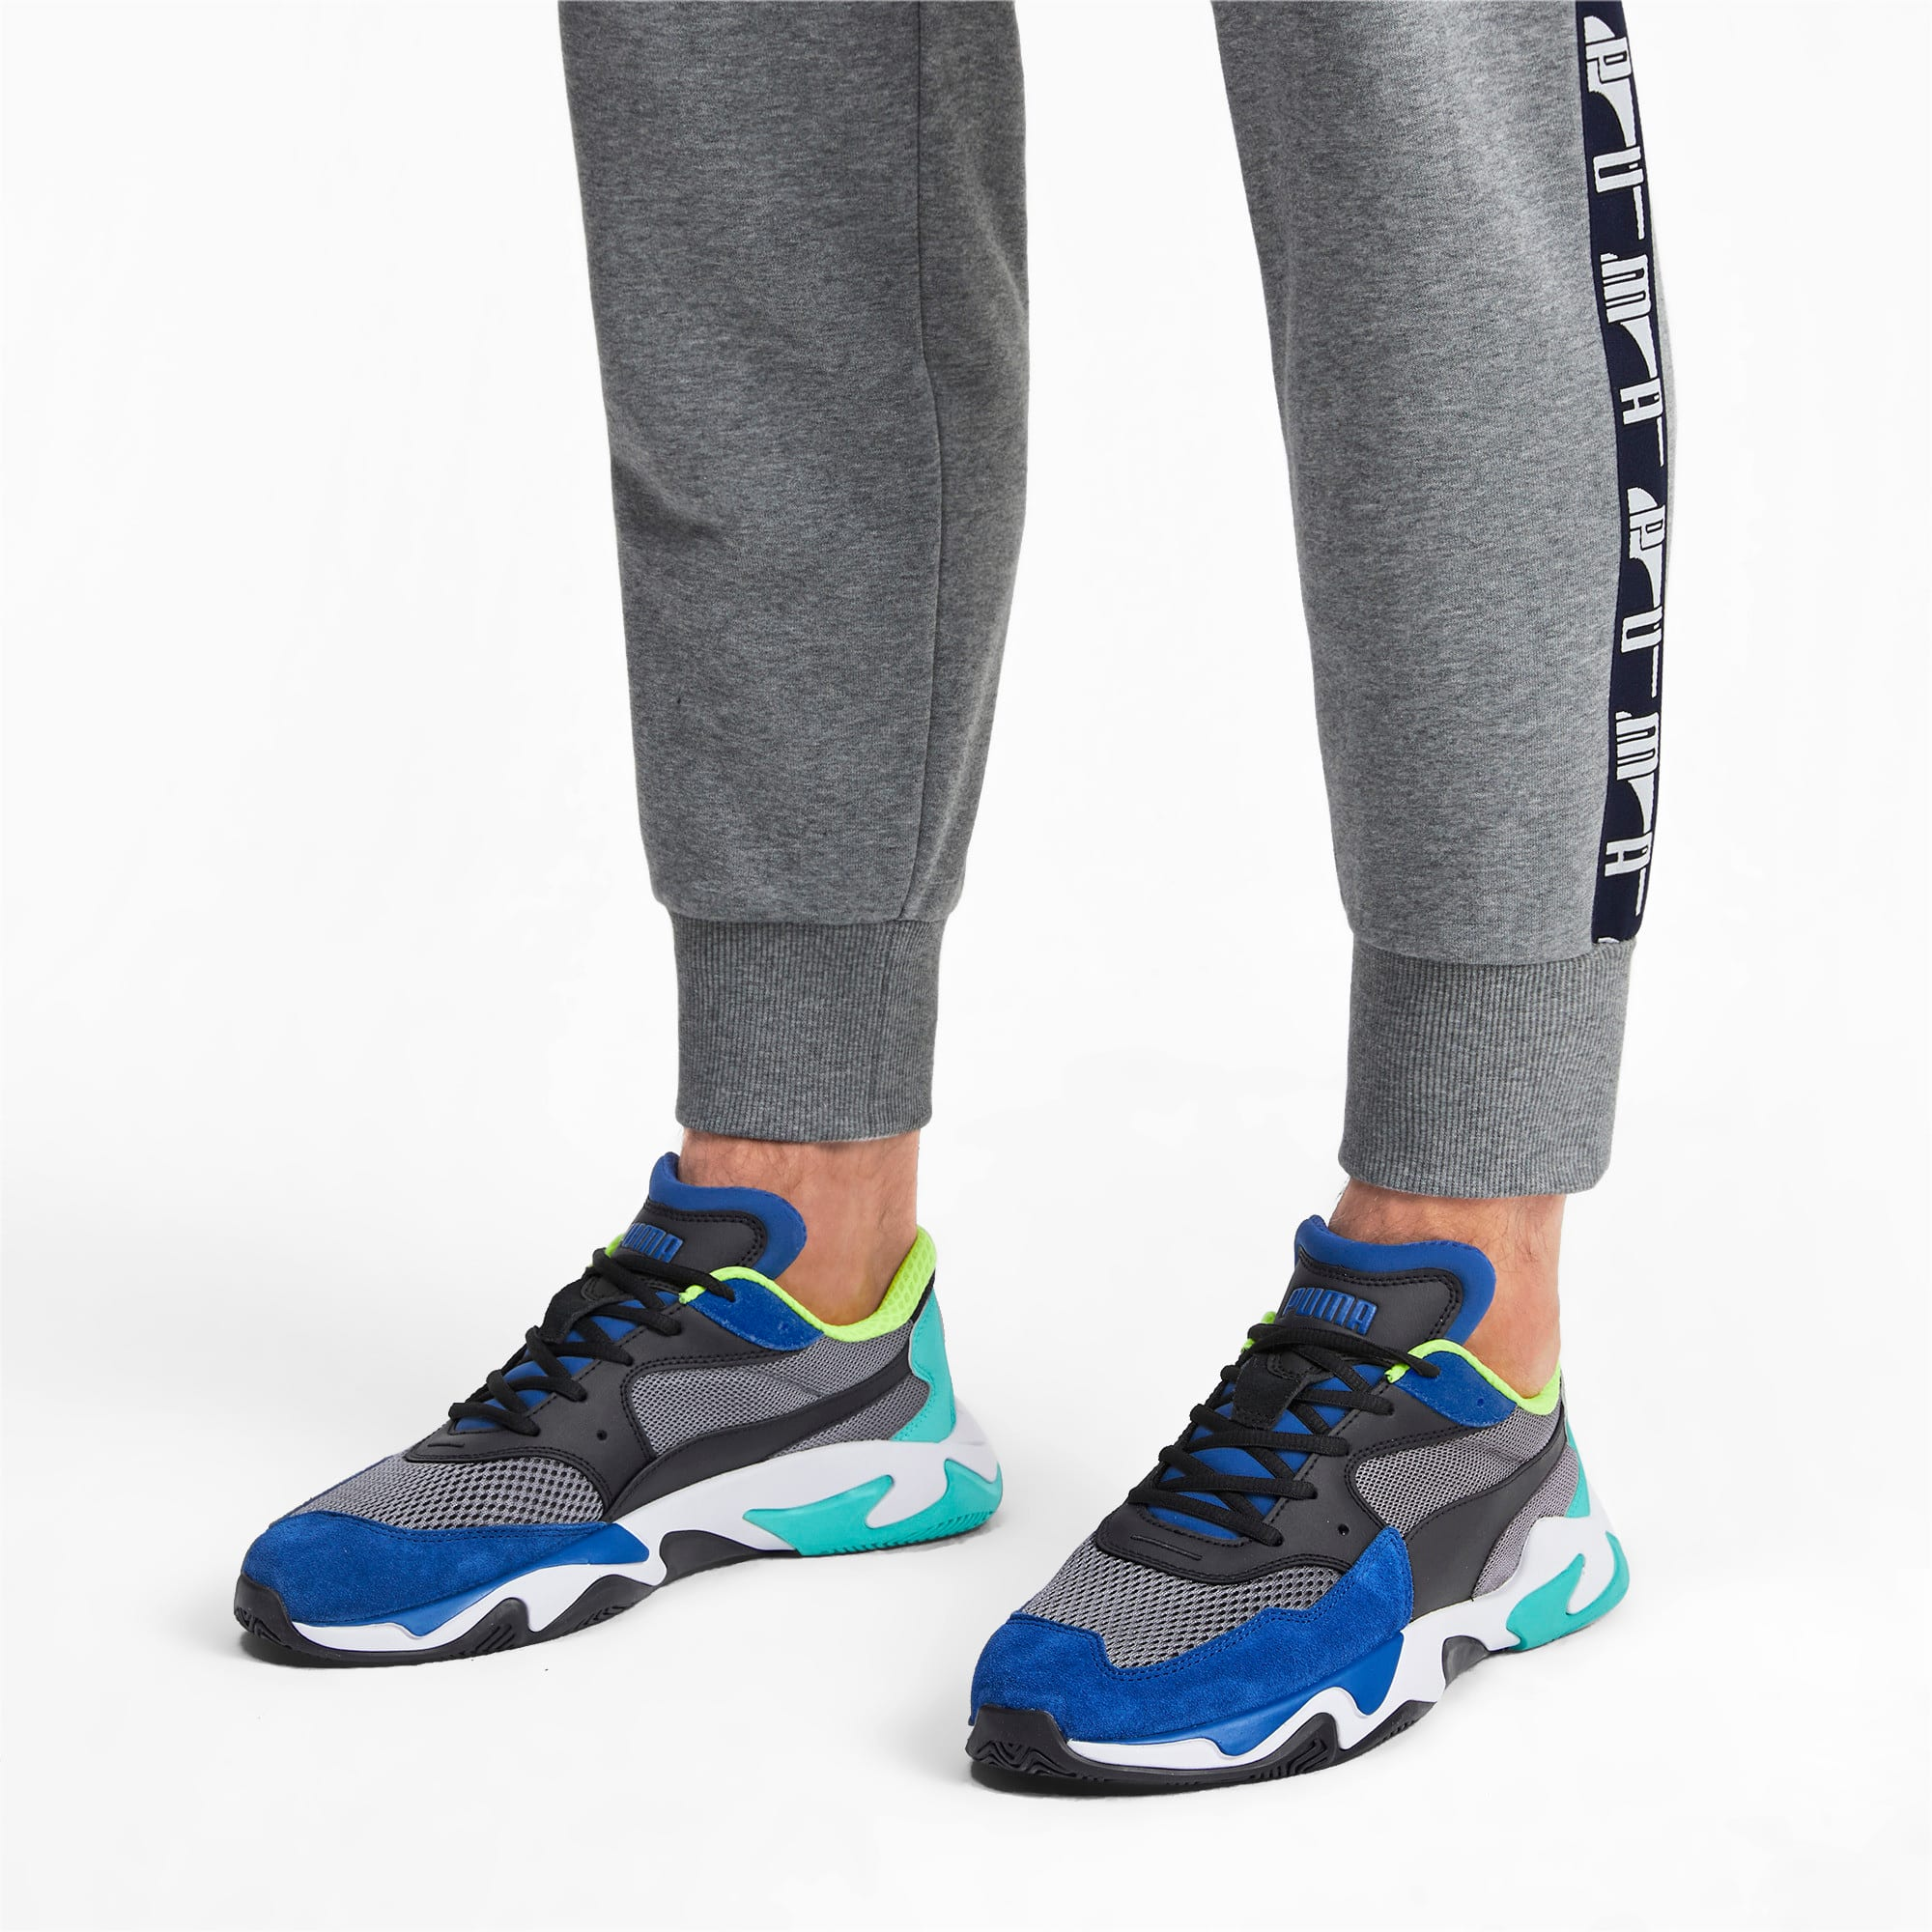 Thumbnail 2 of Storm Origin Sneaker, Galaxy Blue-CASTLEROCK, medium